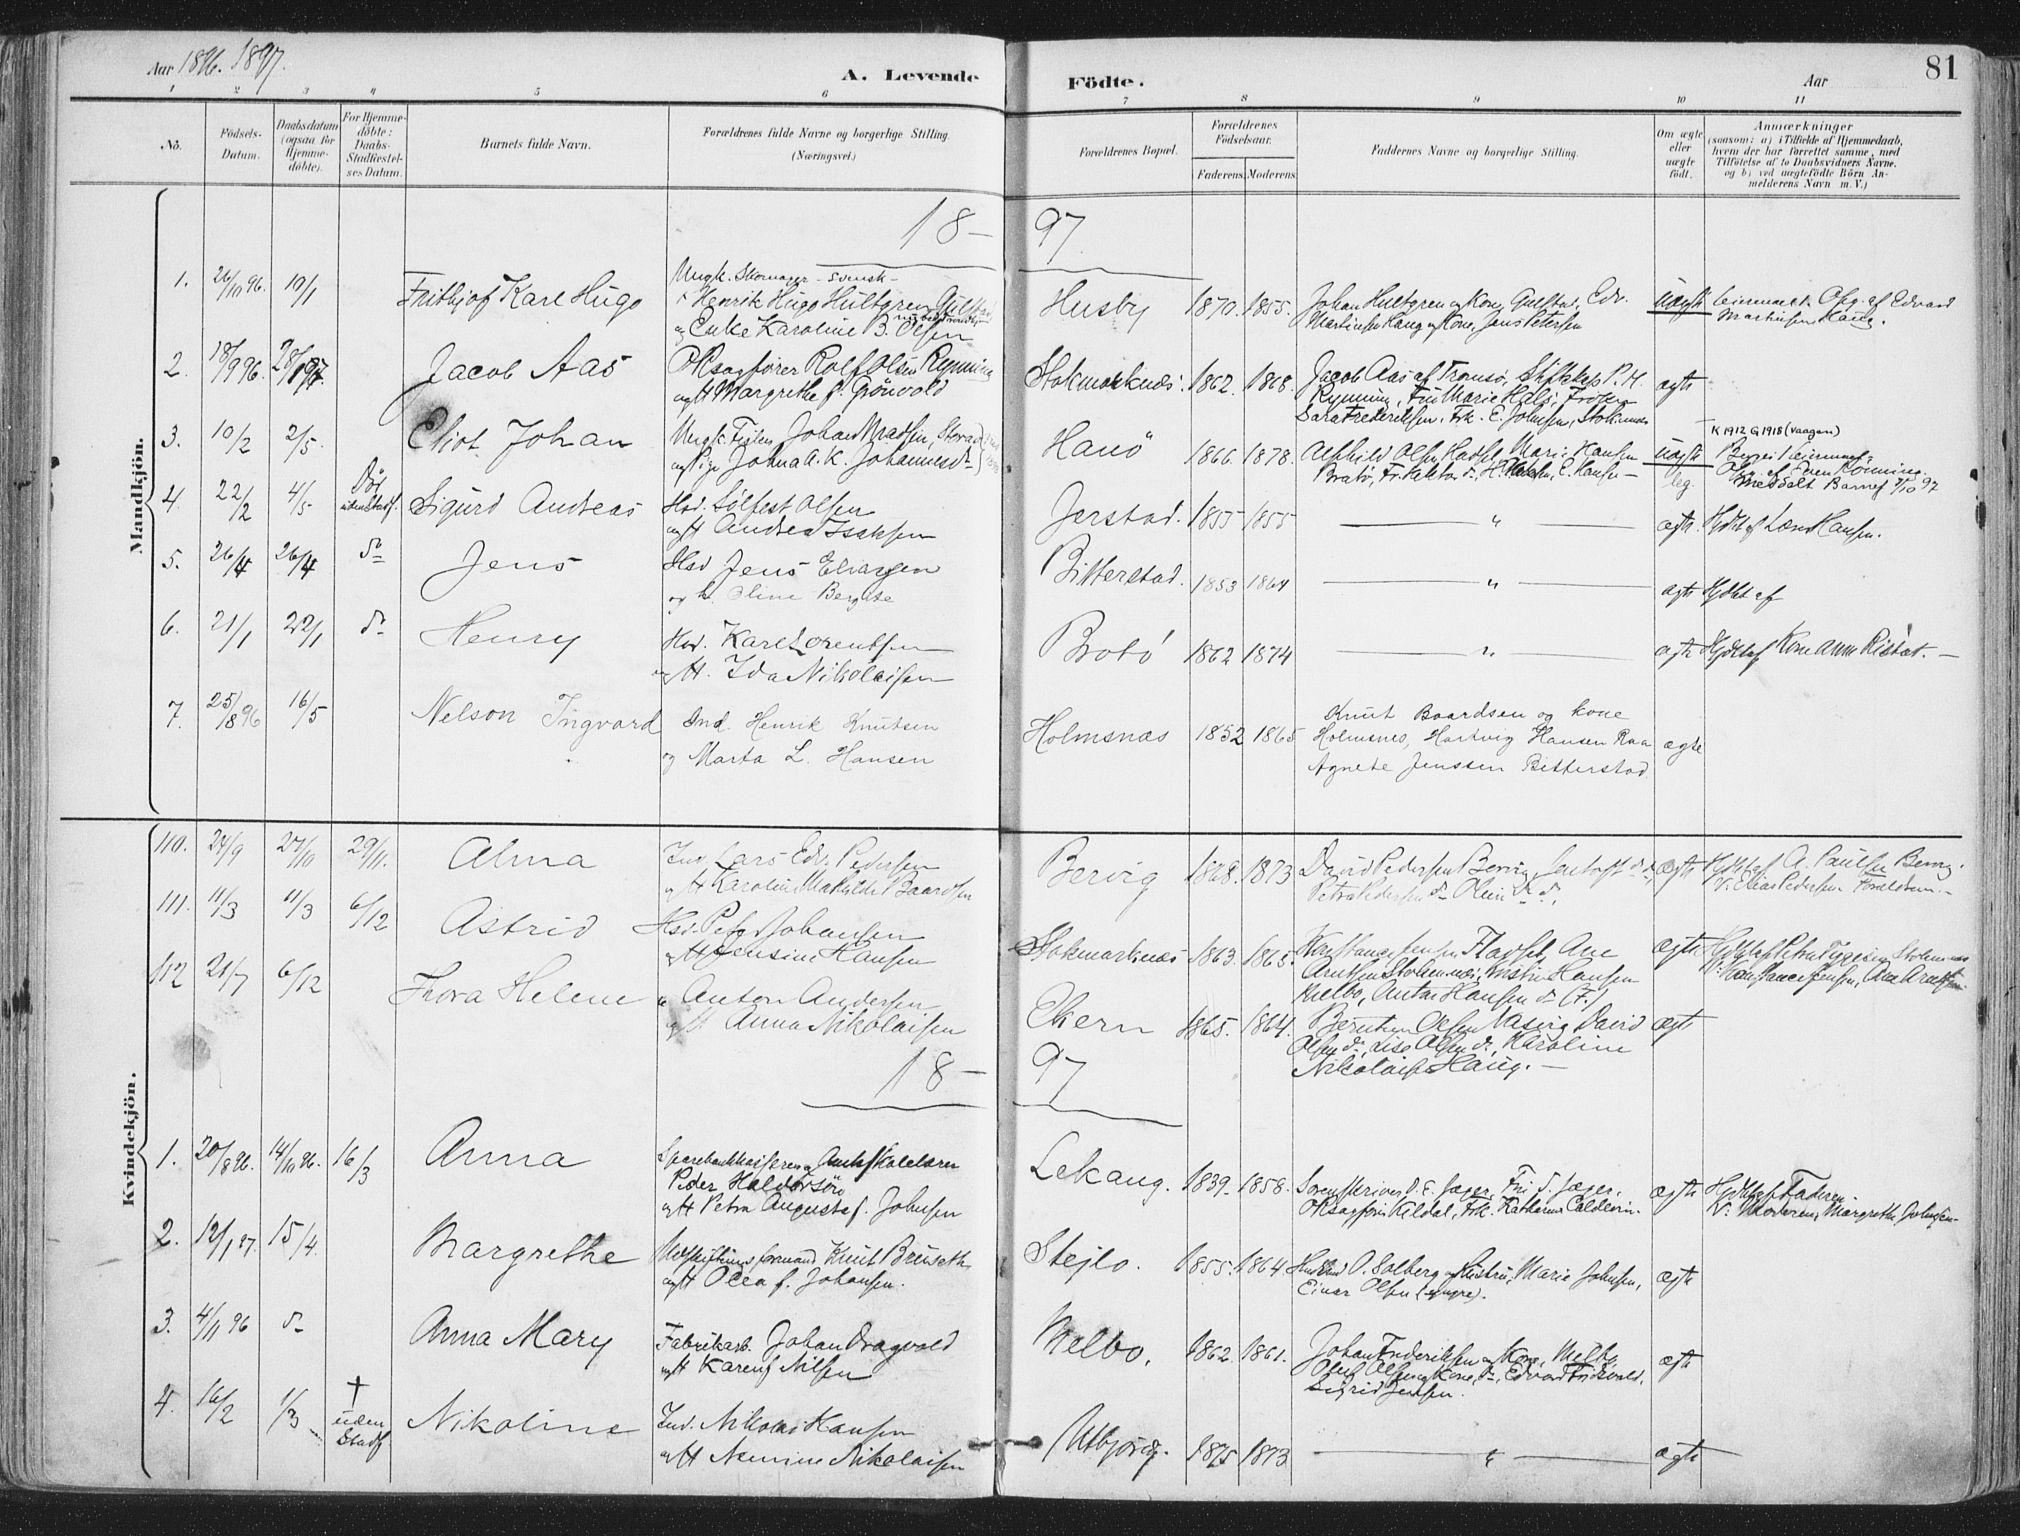 SAT, Ministerialprotokoller, klokkerbøker og fødselsregistre - Nordland, 888/L1246: Ministerialbok nr. 888A12, 1891-1903, s. 81